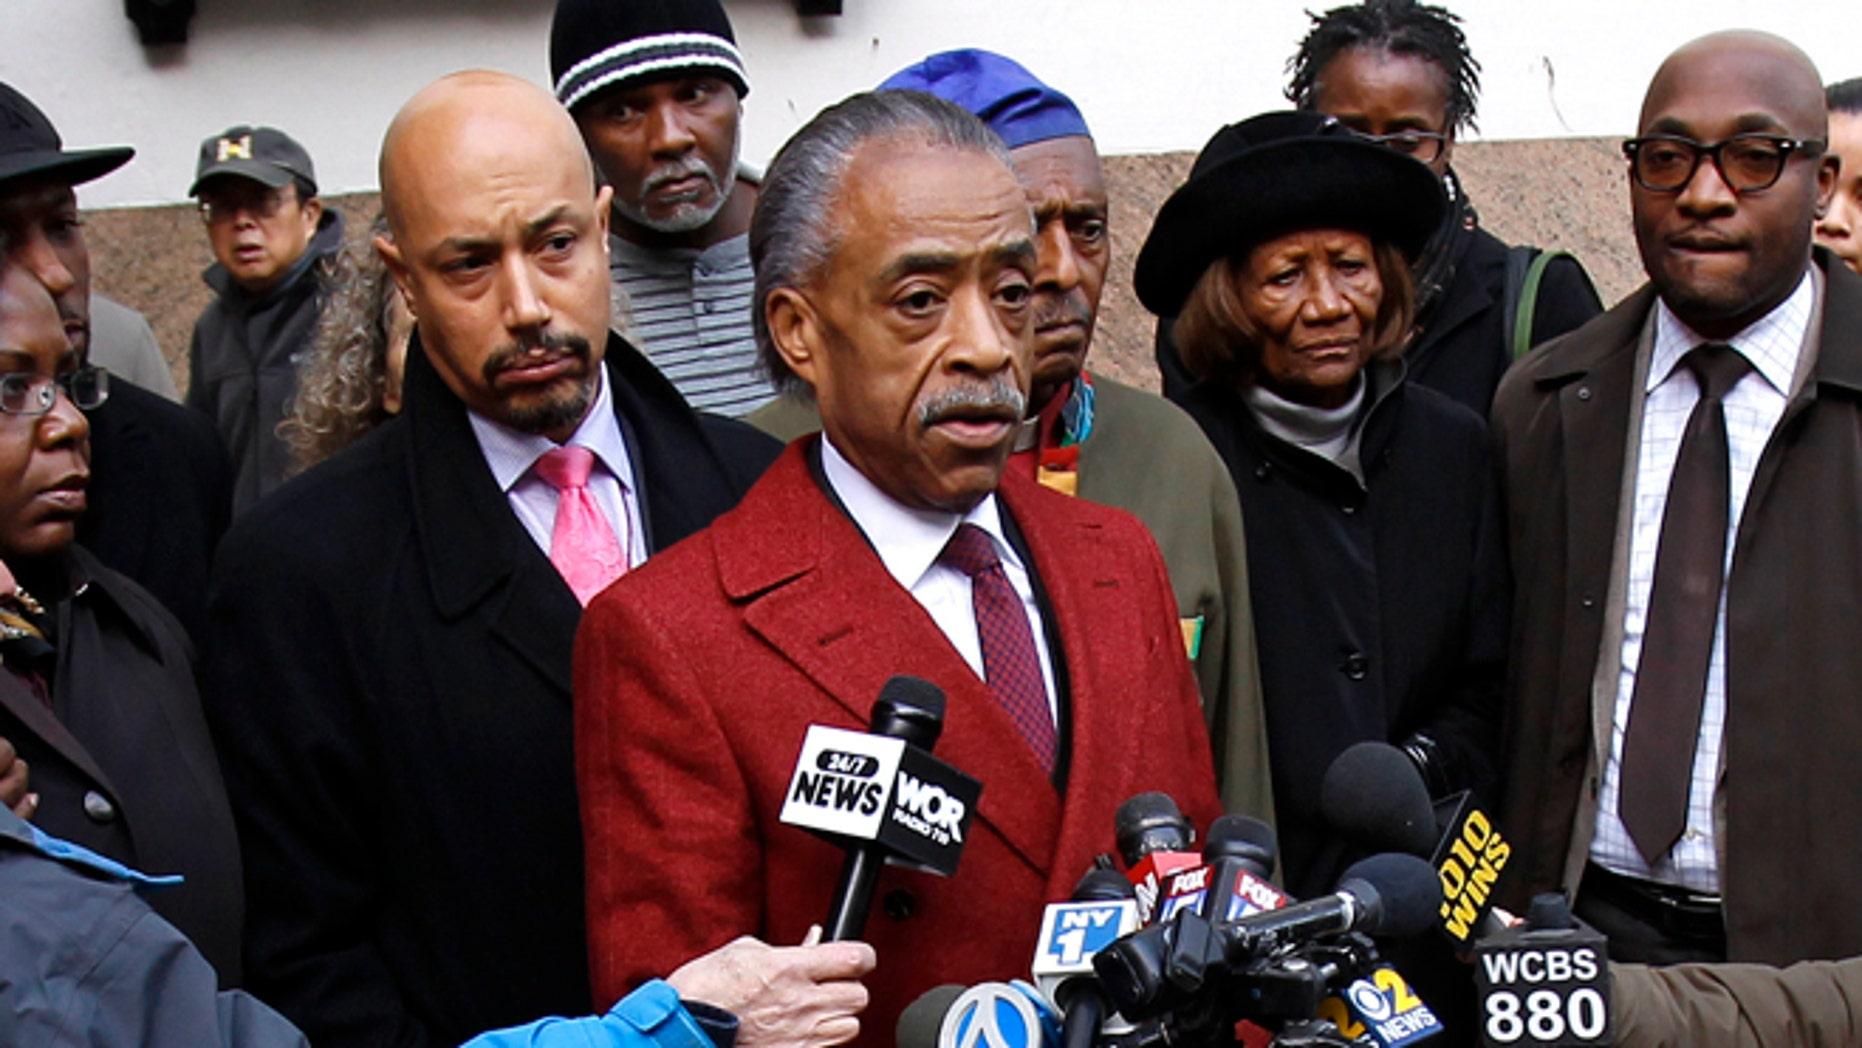 FILE: Nov. 4, 2013: The Rev. Al Sharpton speaks to the media outside Macy's department store, in New York City, N.Y.